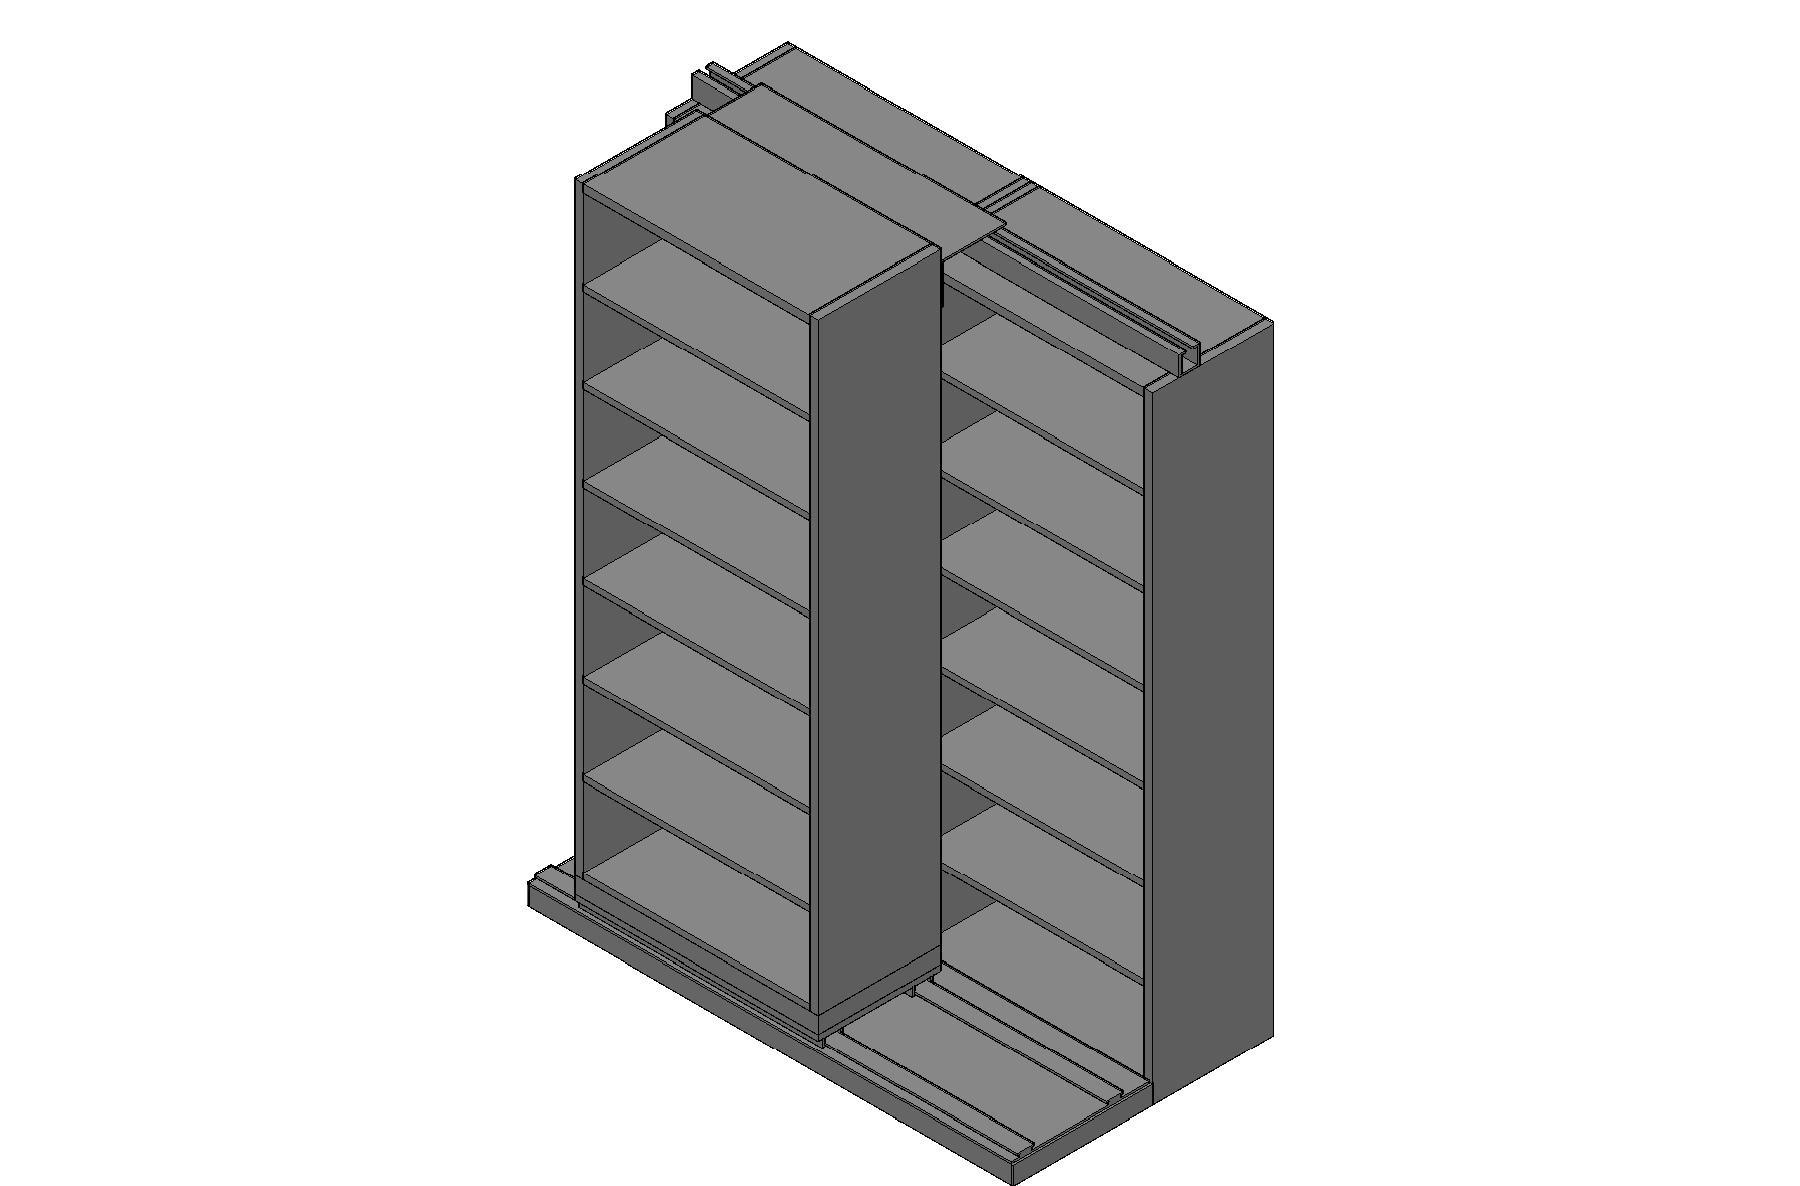 "Legal Size Sliding Shelves - 2 Rows Deep - 7 Levels - (30"" x 15"" Shelves) - 64"" Total Width"